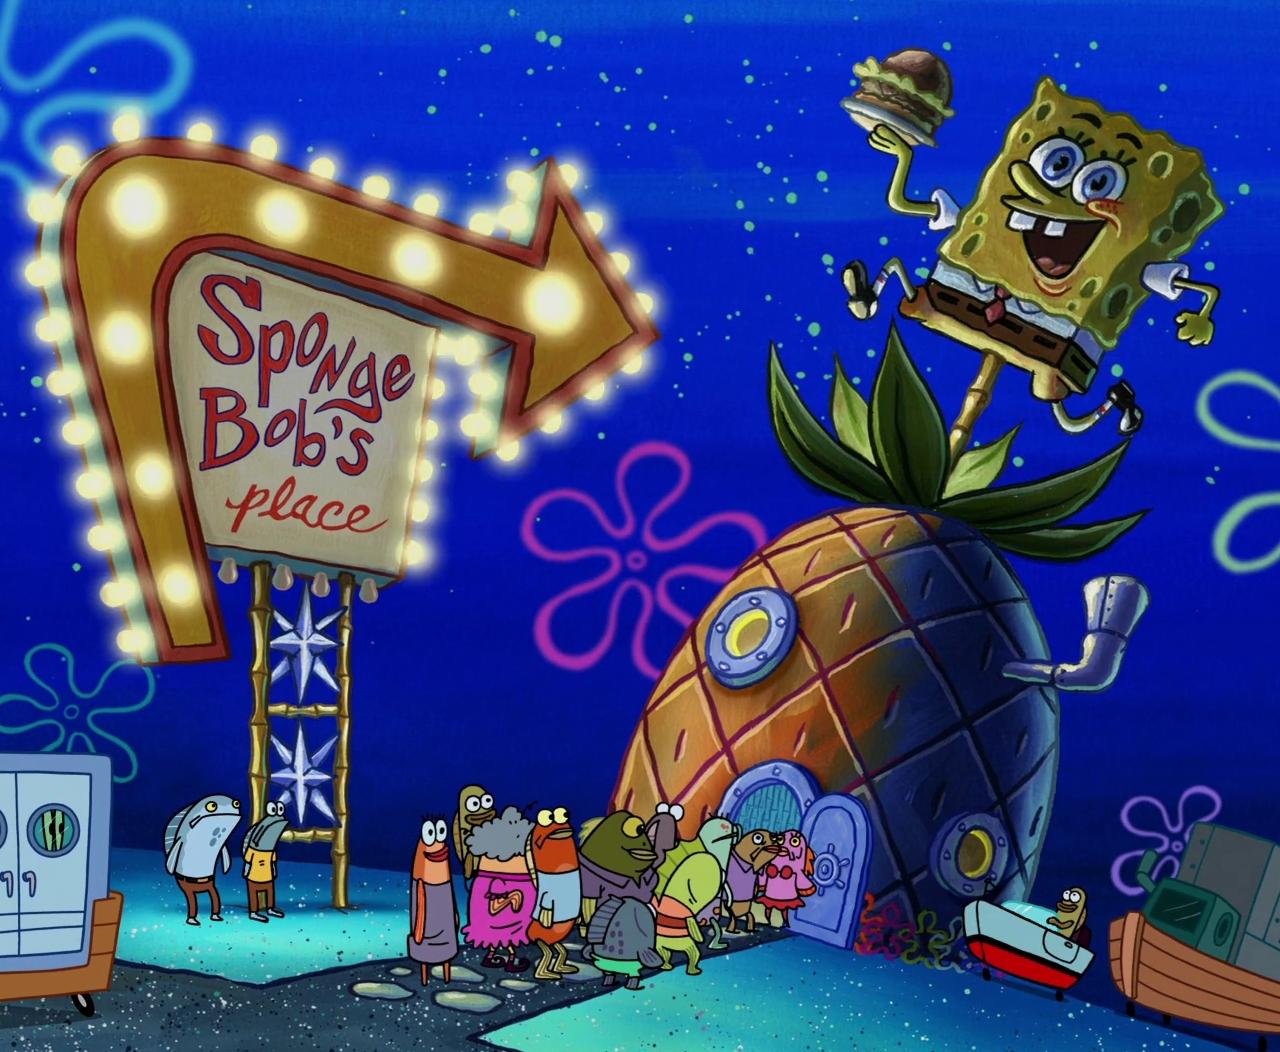 SpongeBob's Place (restaurant)